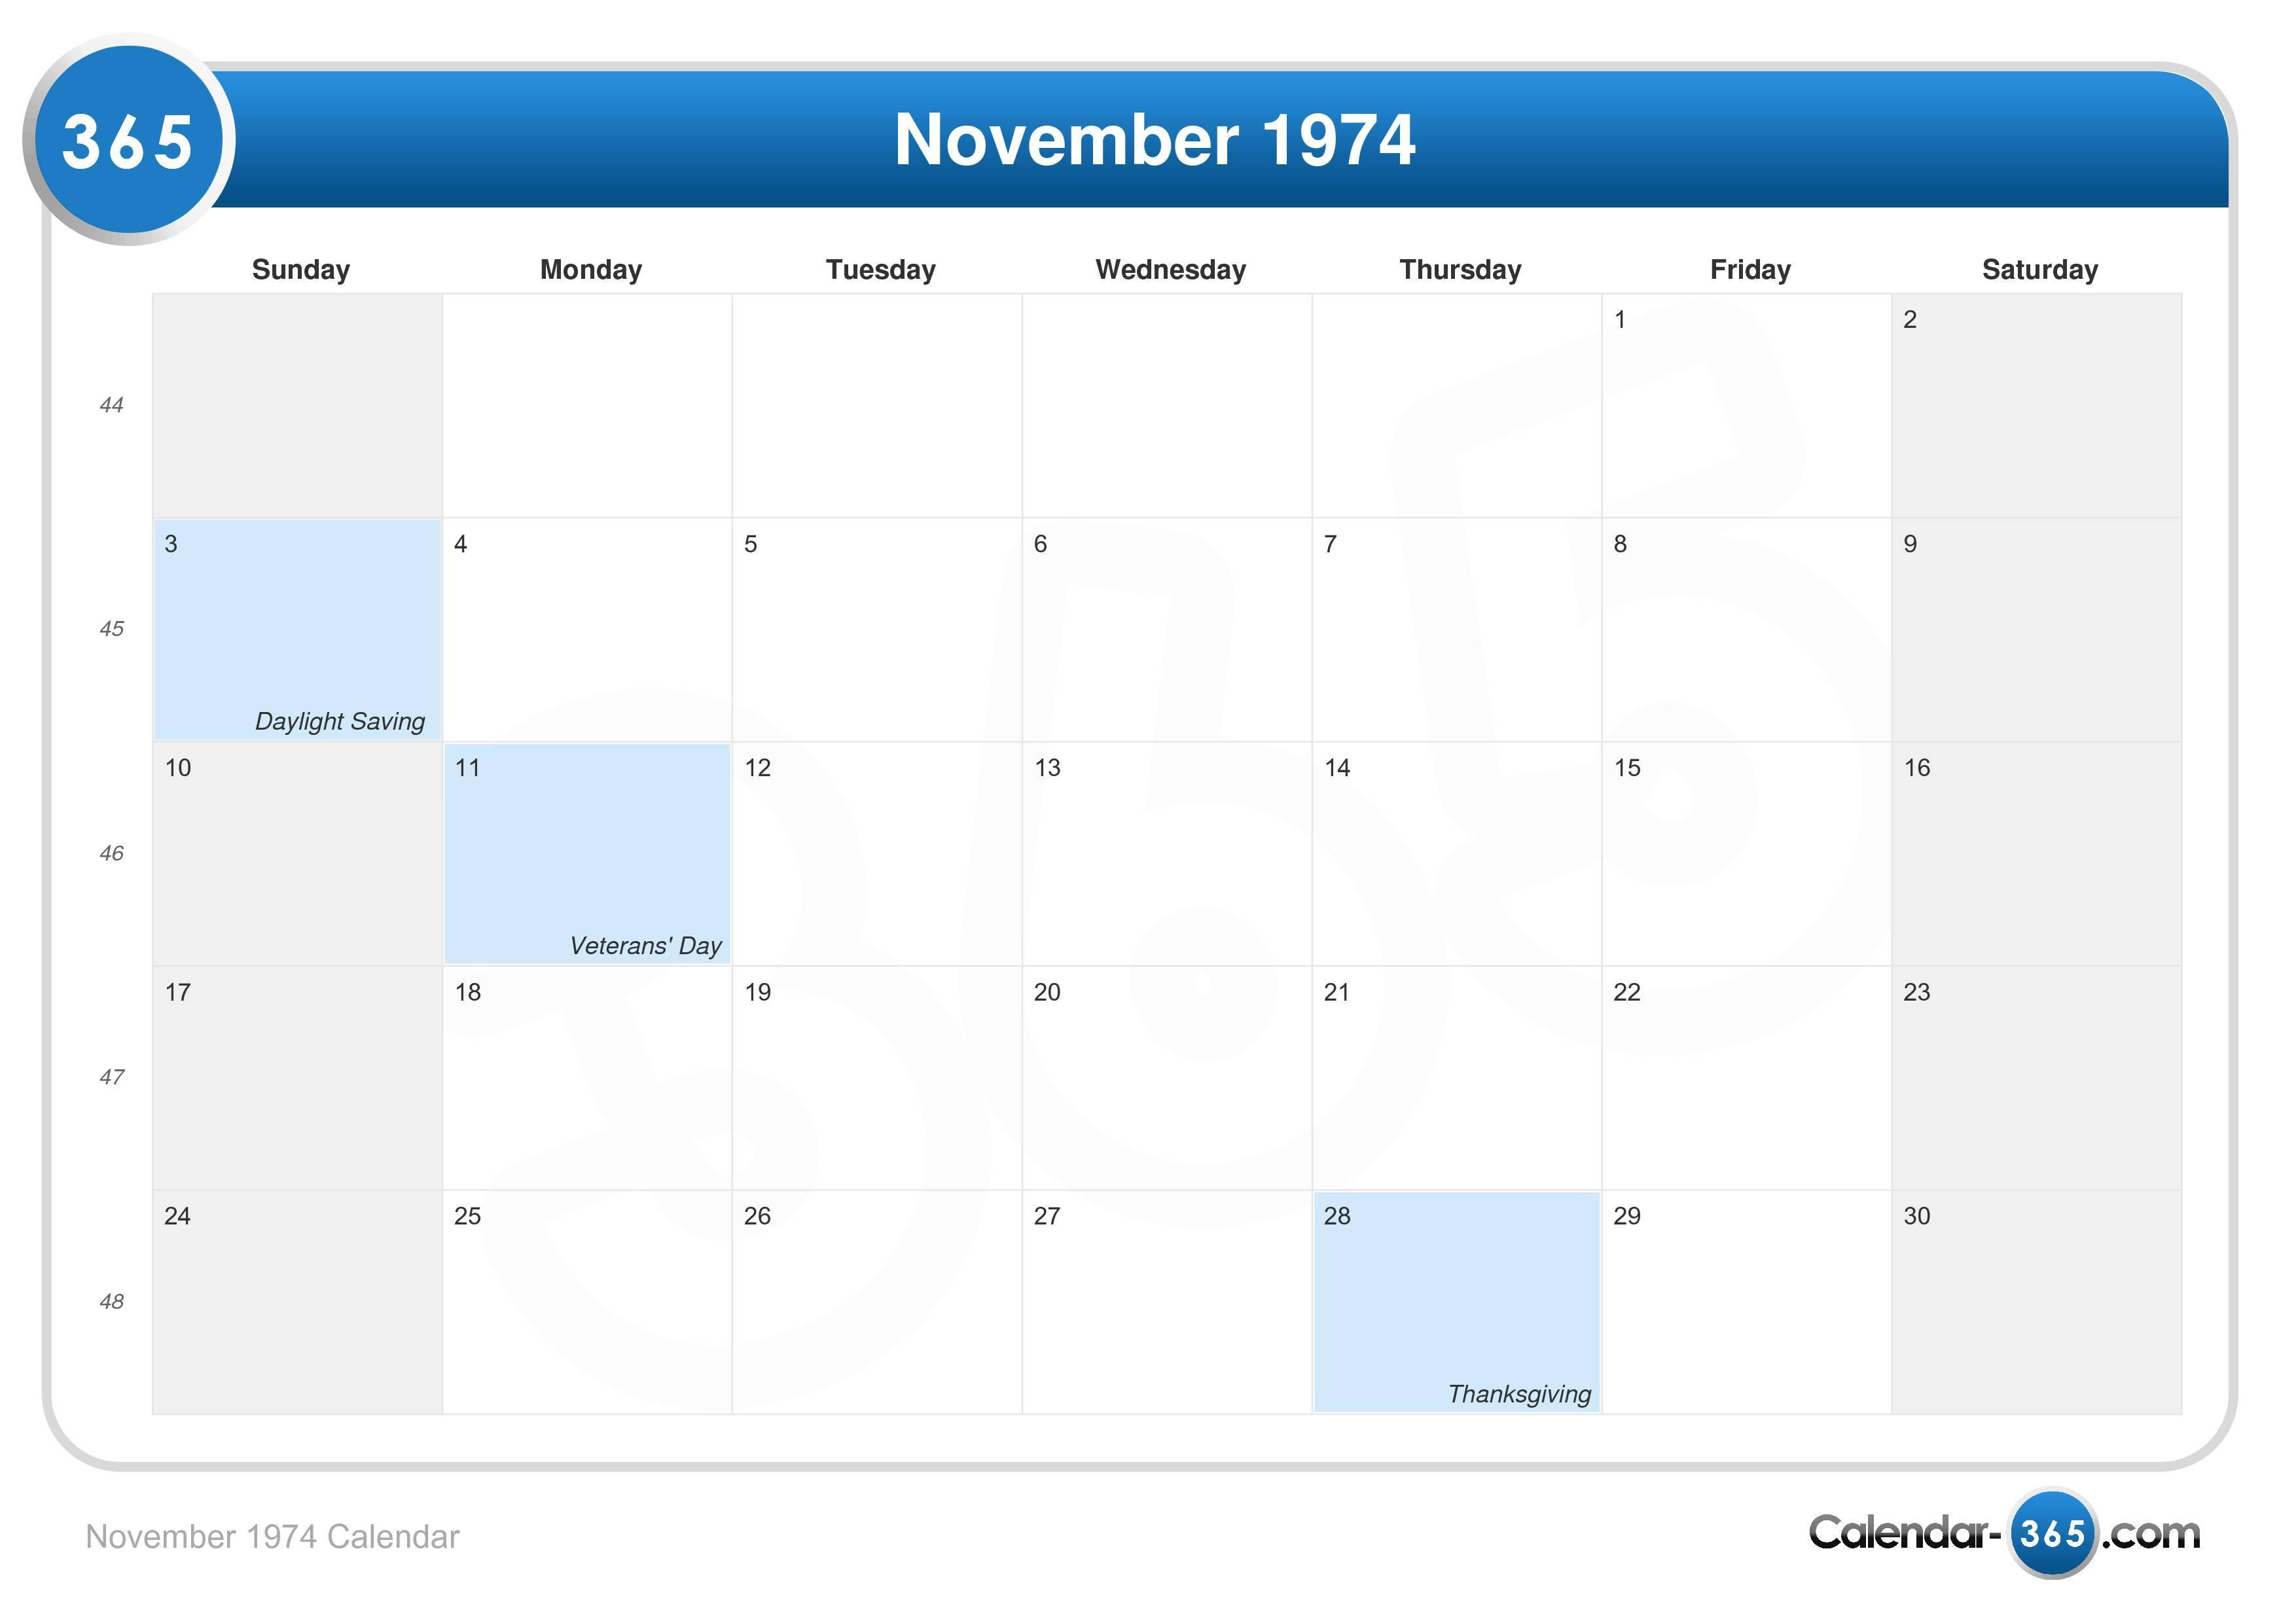 November 1974 Calendar